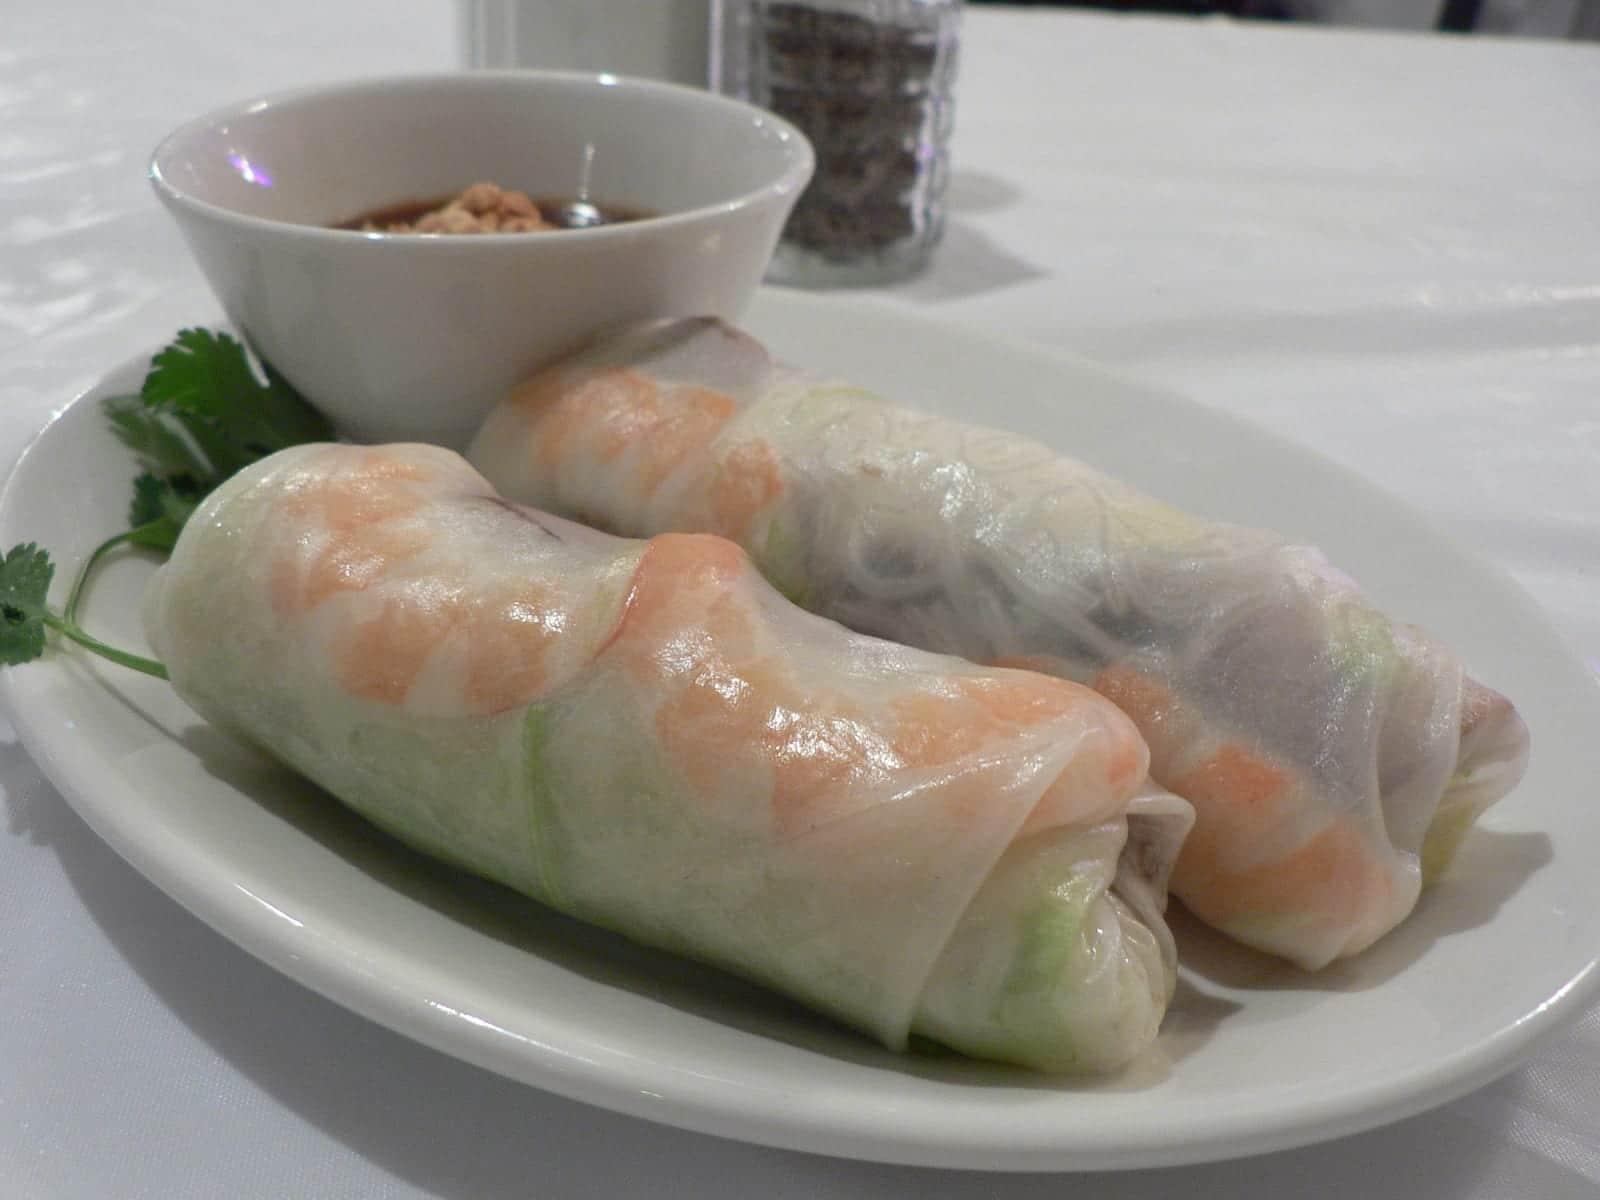 Vietnamese spring roll (Gỏi cuốn), Vn